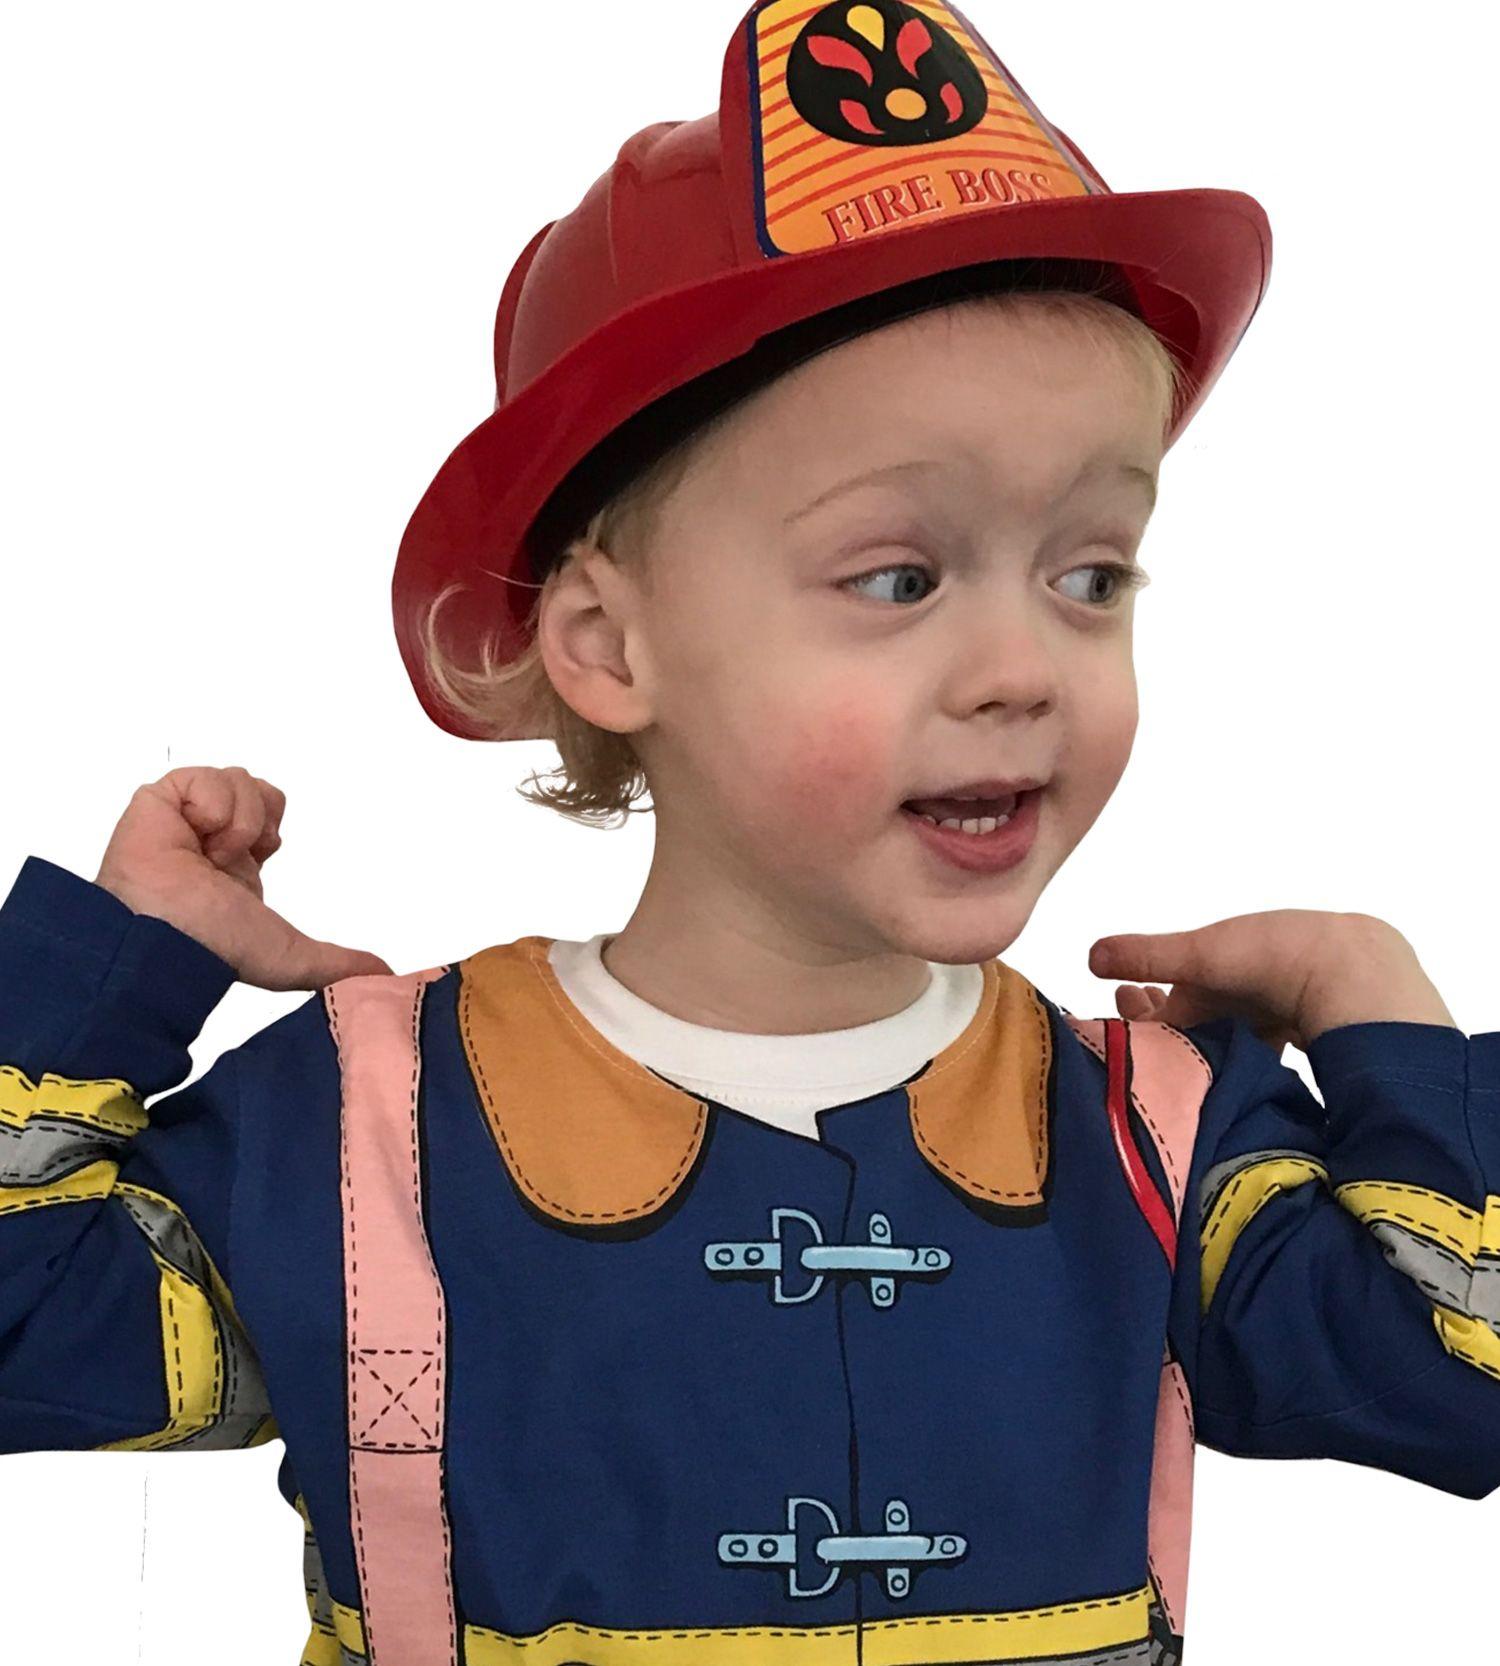 Brandmands kostume i 100% bomuld